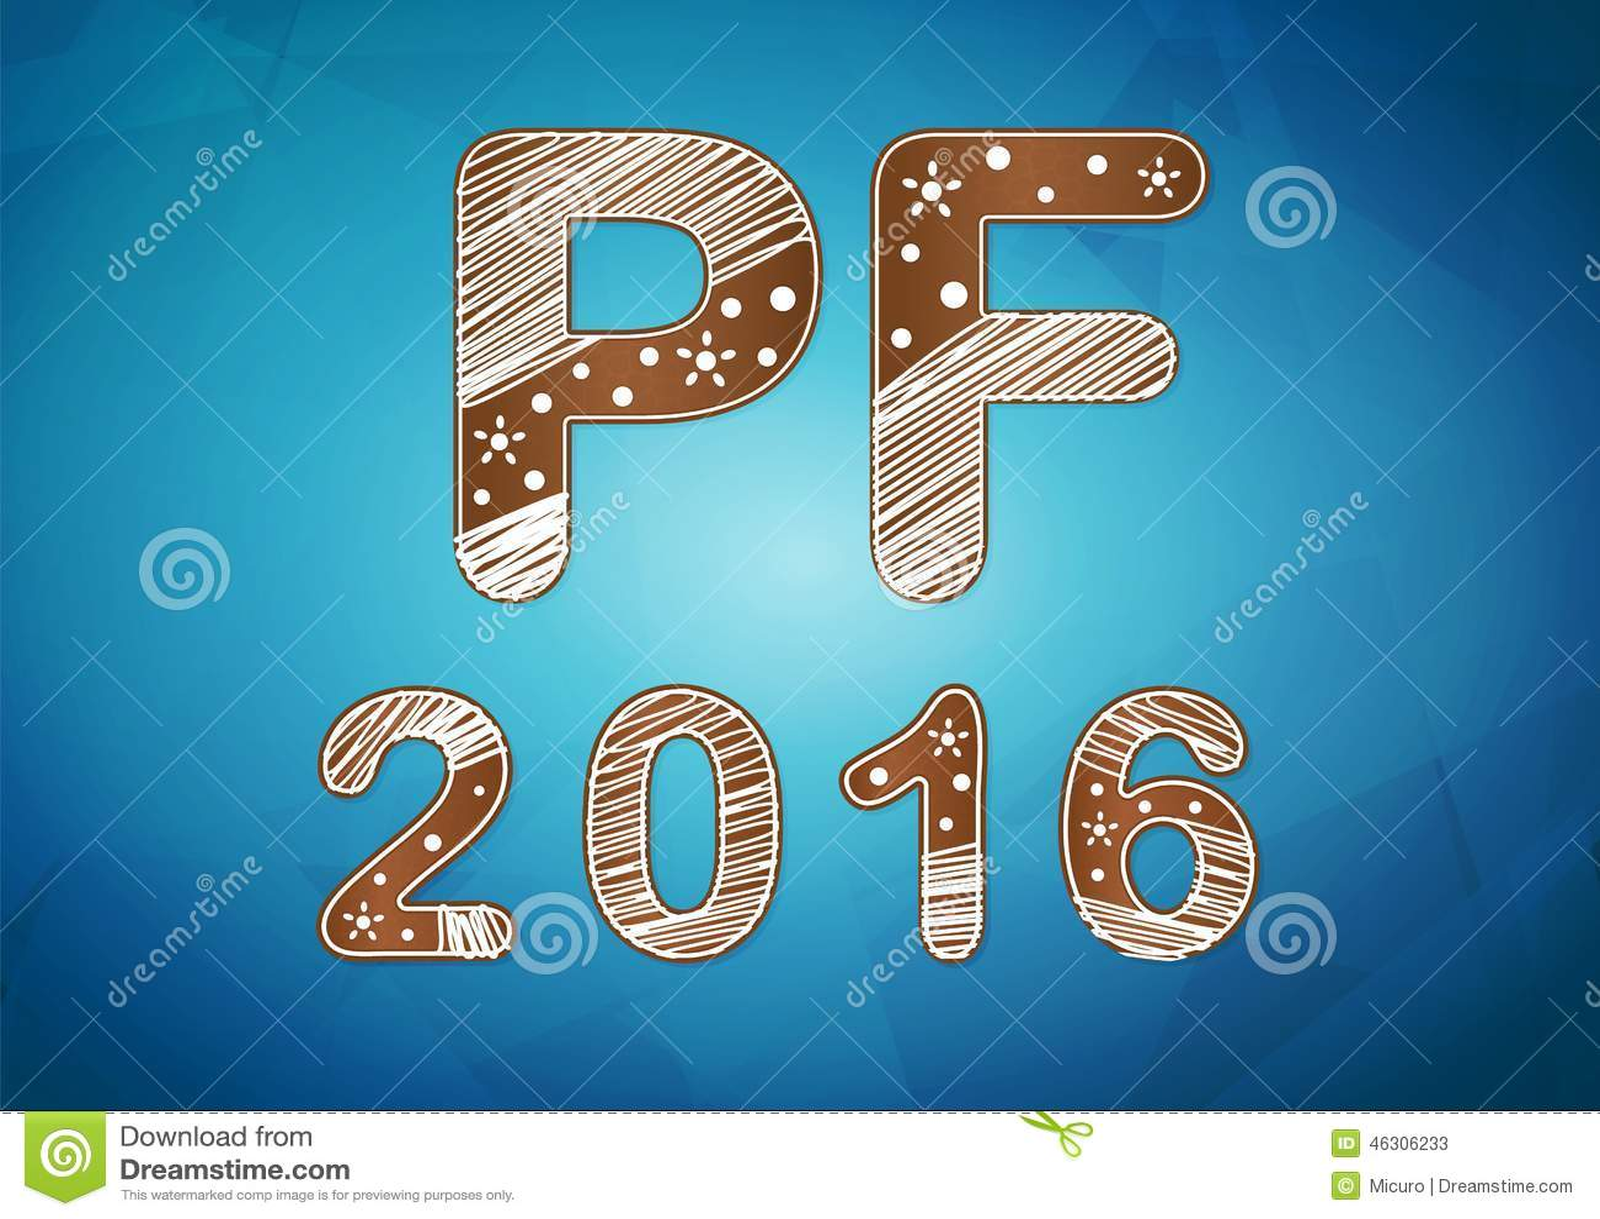 New year 2016 wish card vector illustration.